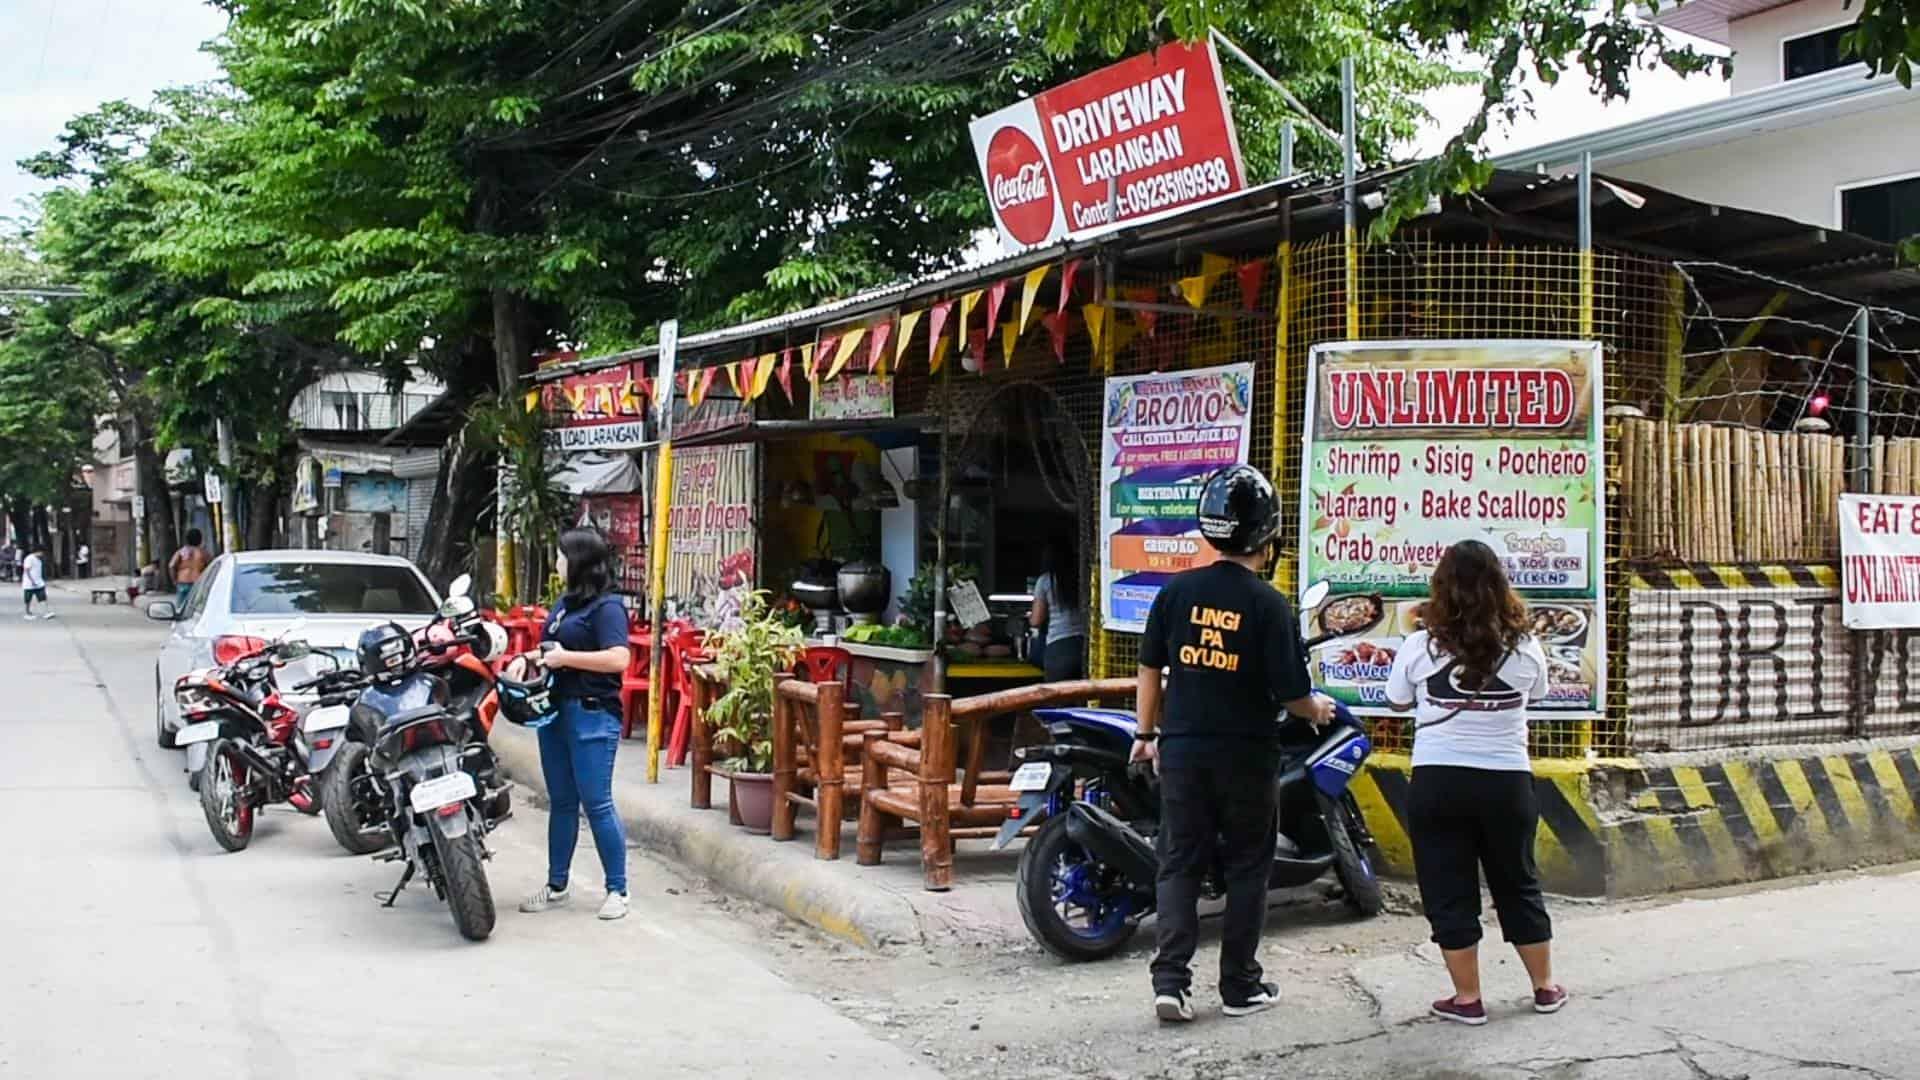 Driveway Laragan and Season Unli Cebu (4)